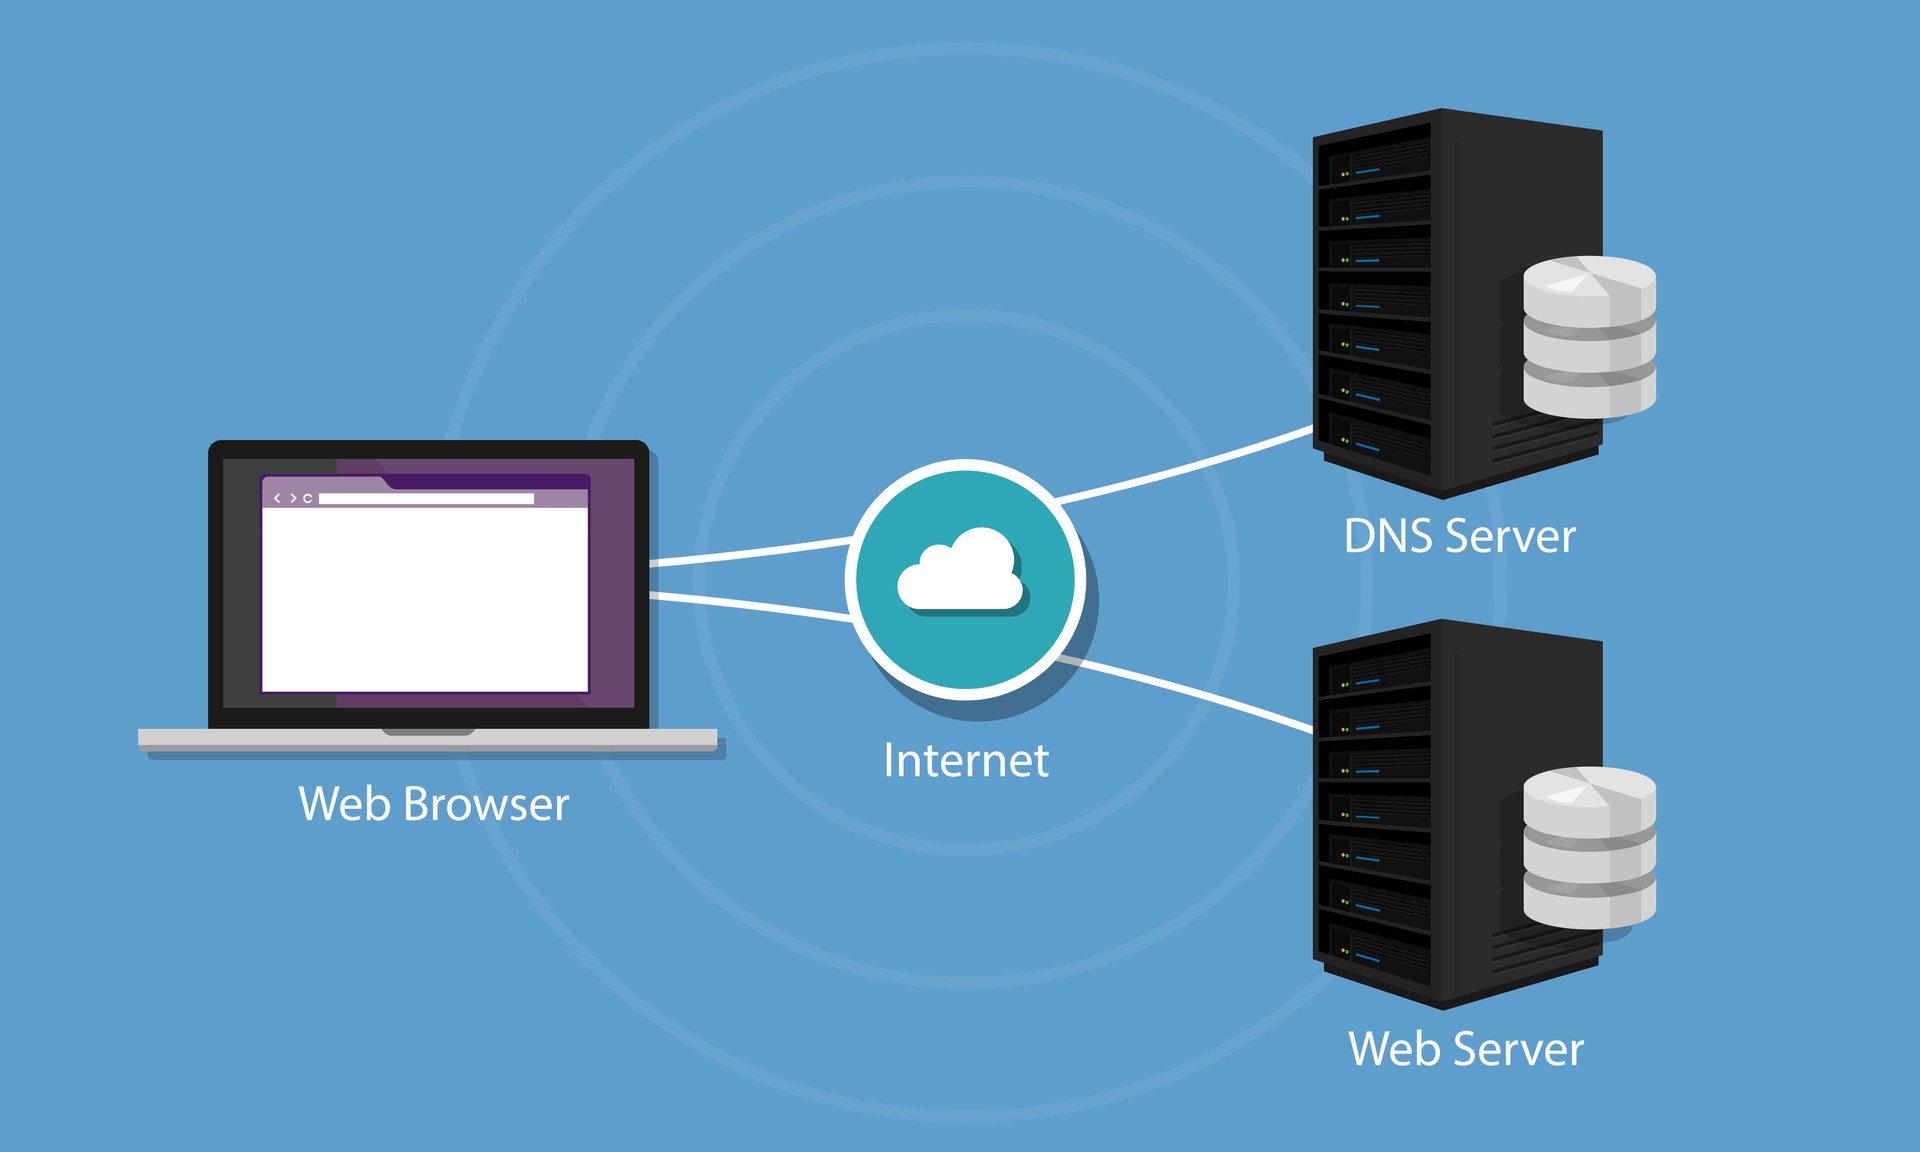 Создание DNS сервера на Windows Server 2019